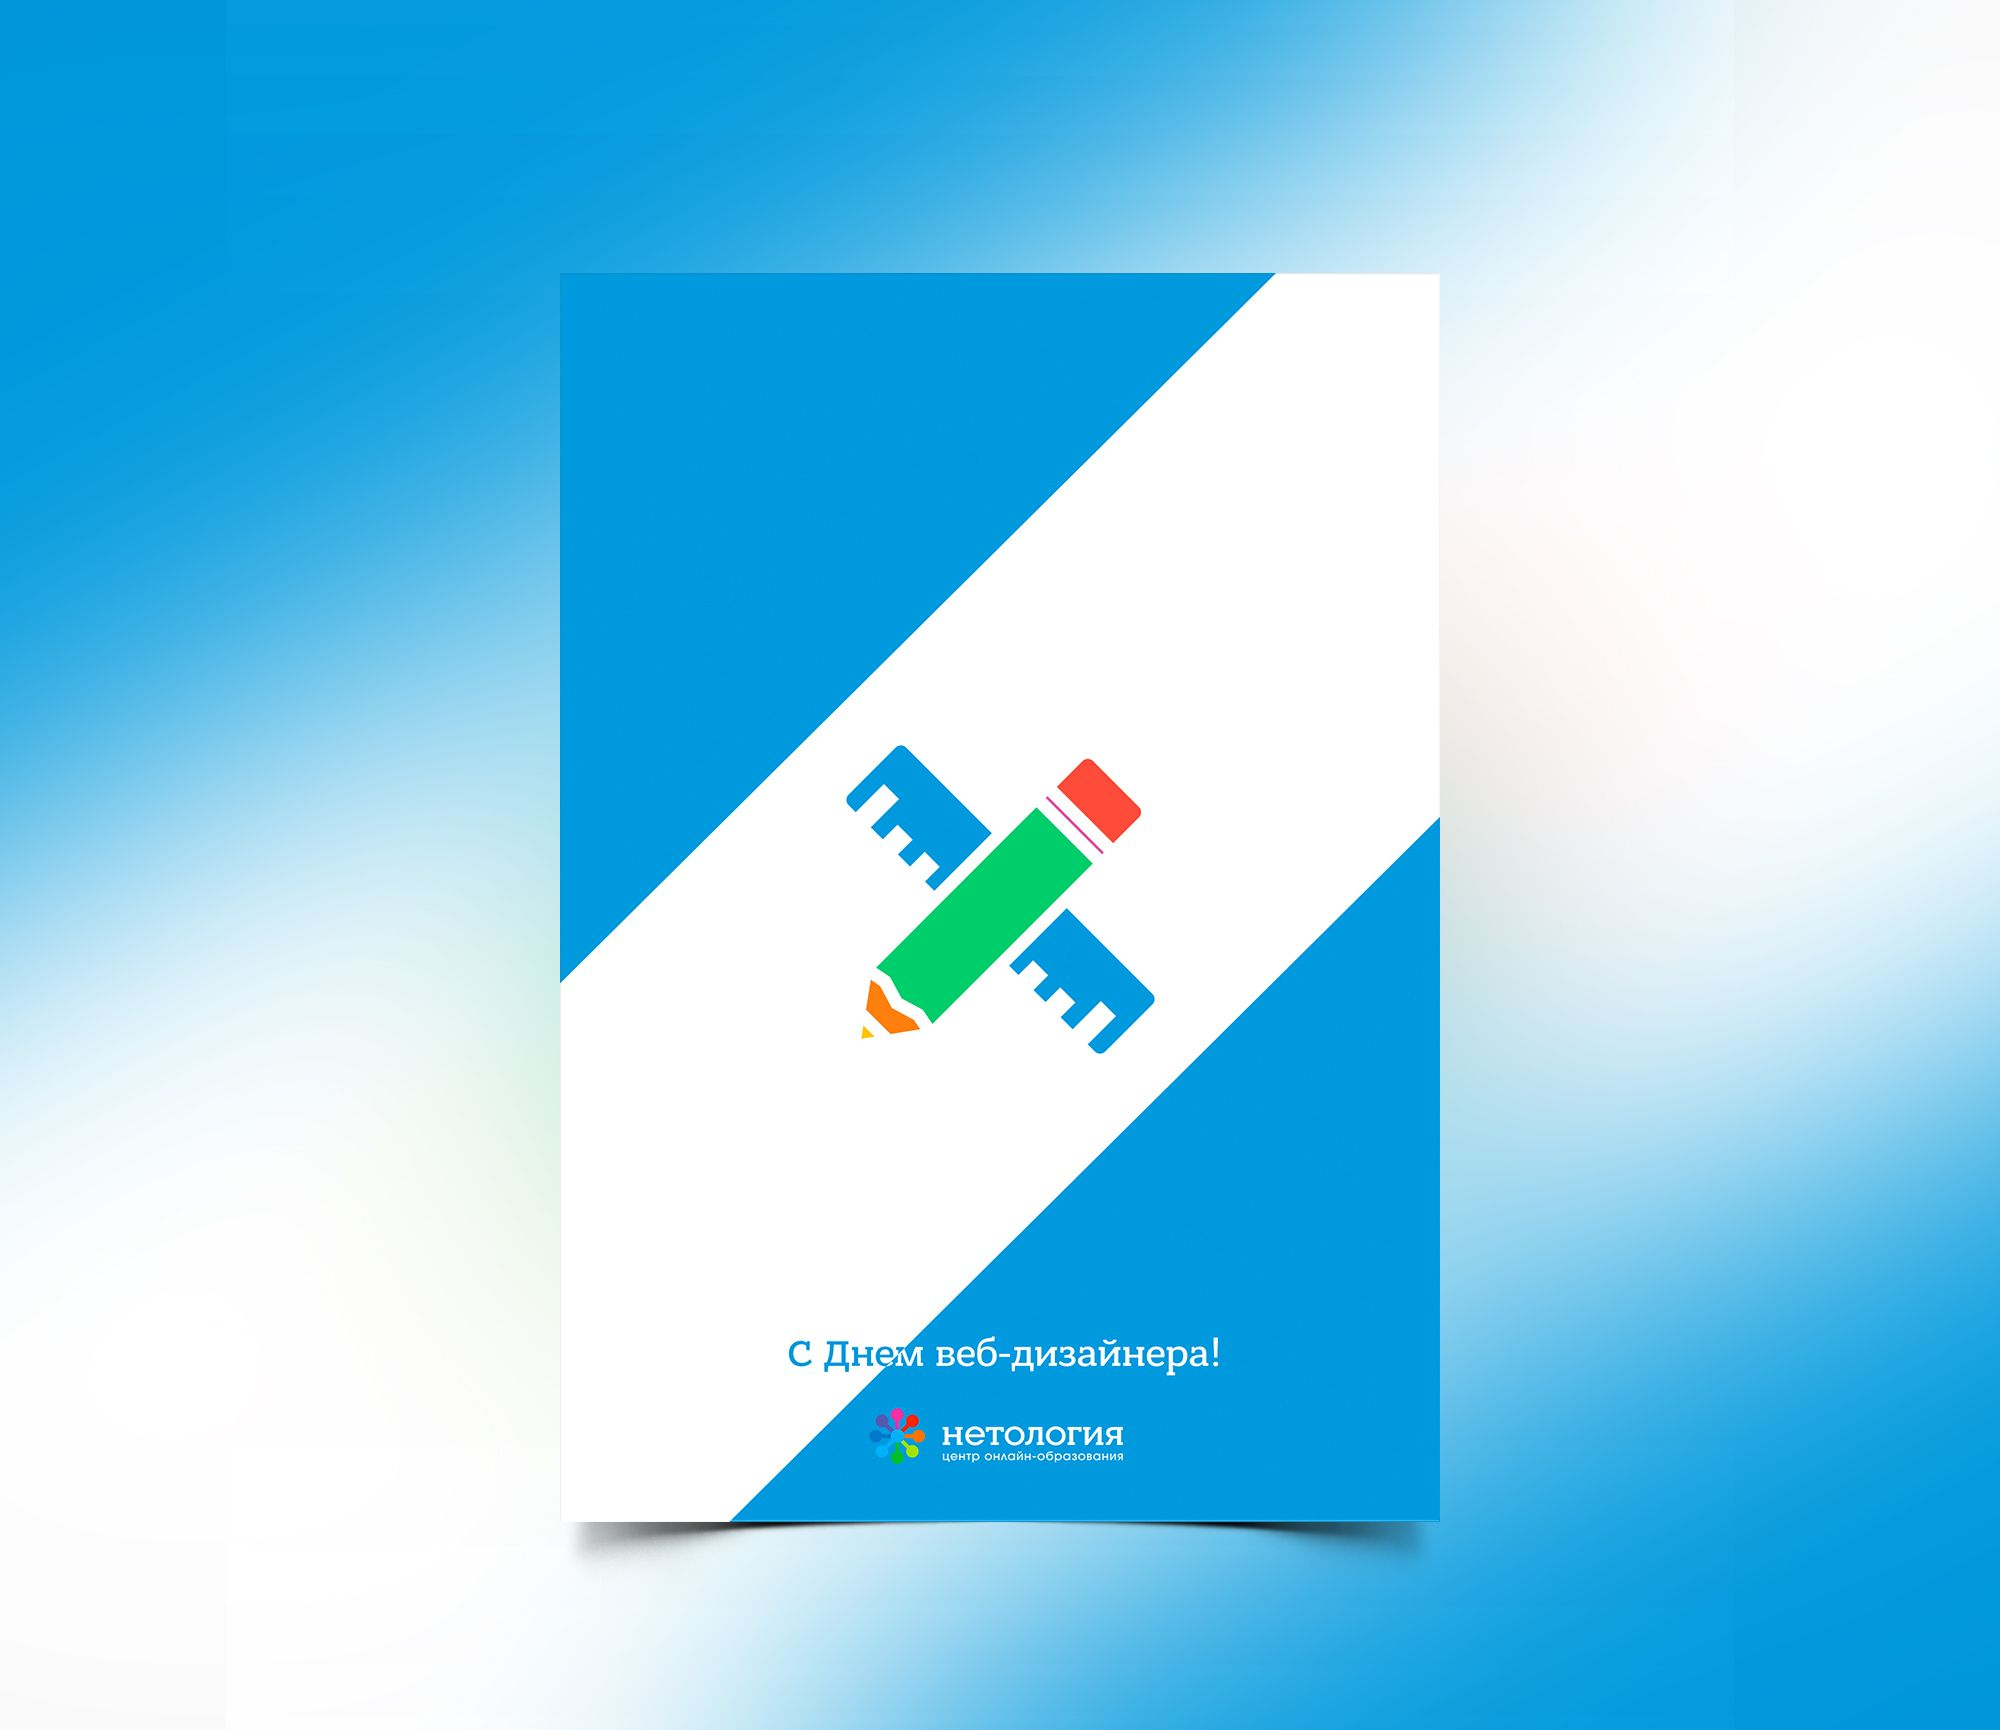 Дизайн открытки. Приз – онлайн-курс по веб-дизайну - дизайнер spivachuk